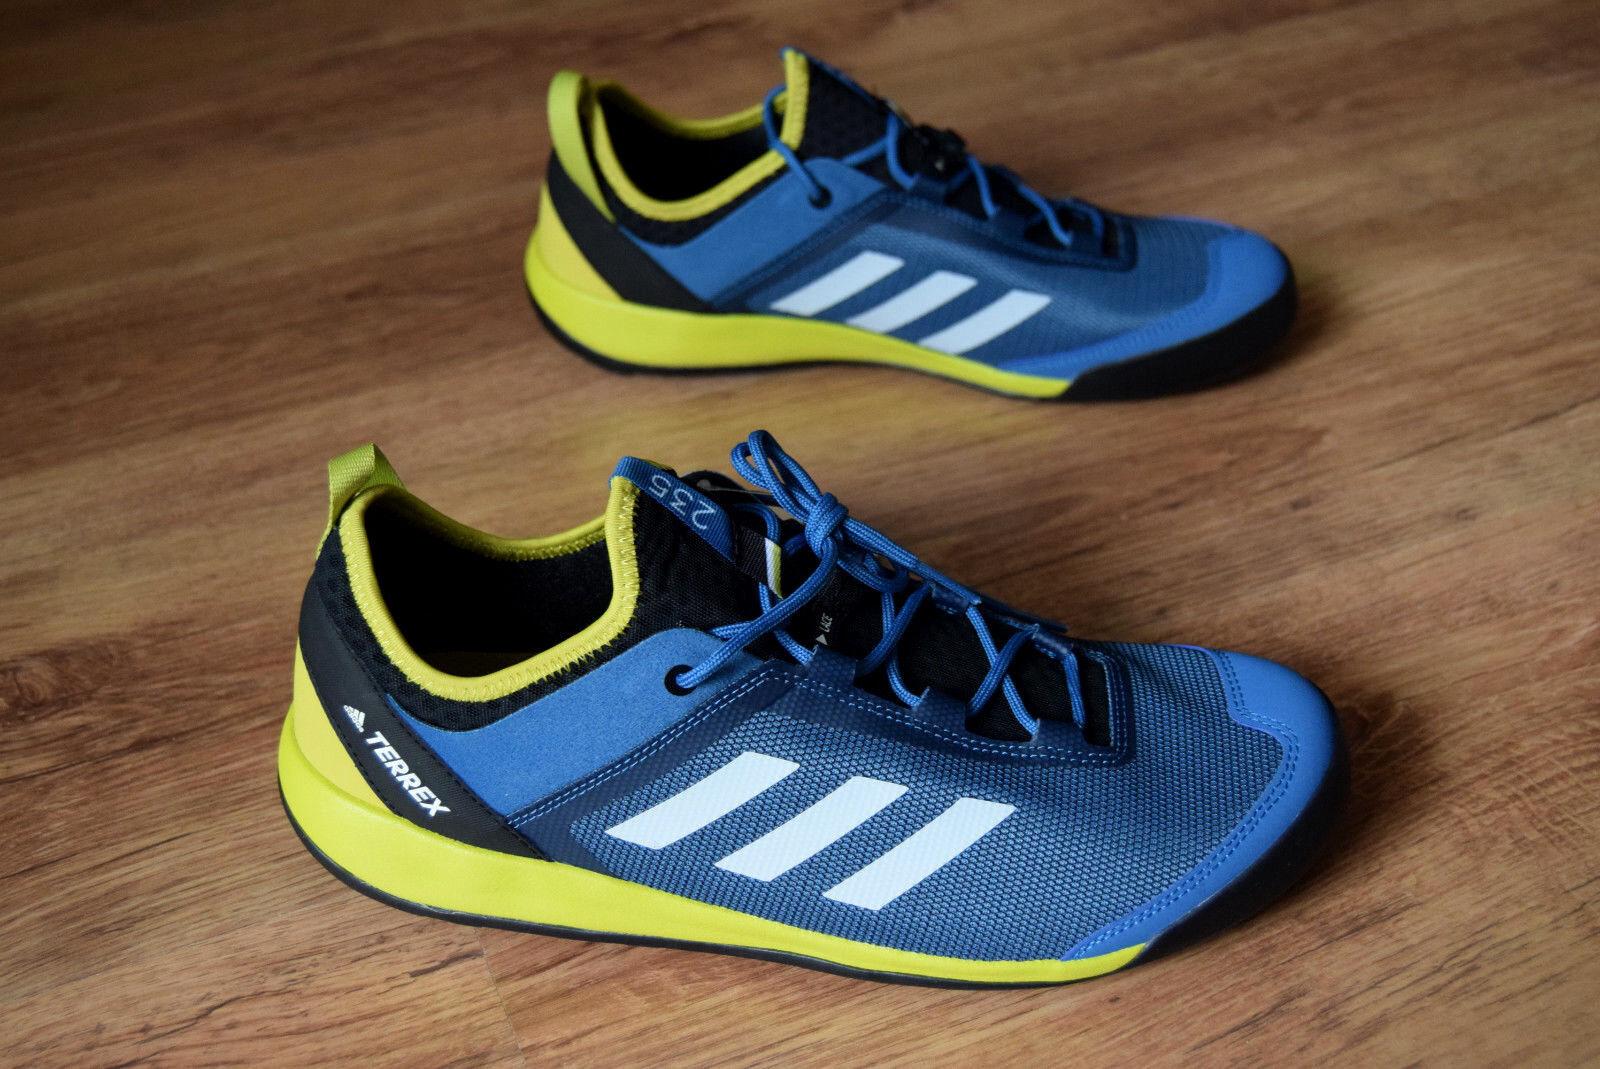 Adidas Terrex Swift Solo 42 43 44 45 46 47 BB1993 Wanderschuhe fast ax 2 agravic